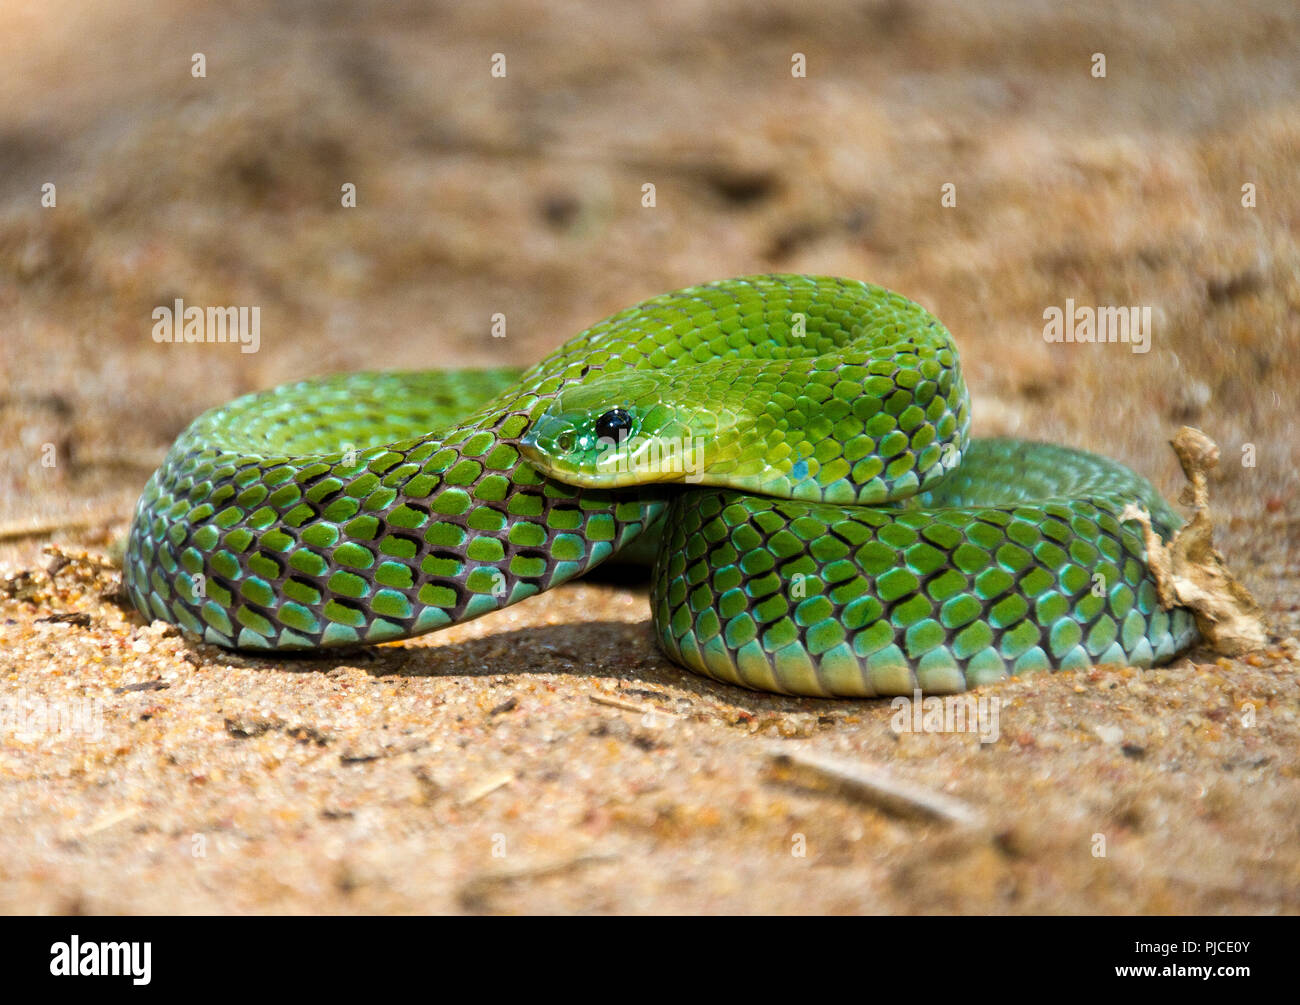 The verdant colours of the Velvety Green Night Adder. A mildly venomous member of the viper family that hunts amphibians in the wet grasslands. - Stock Image